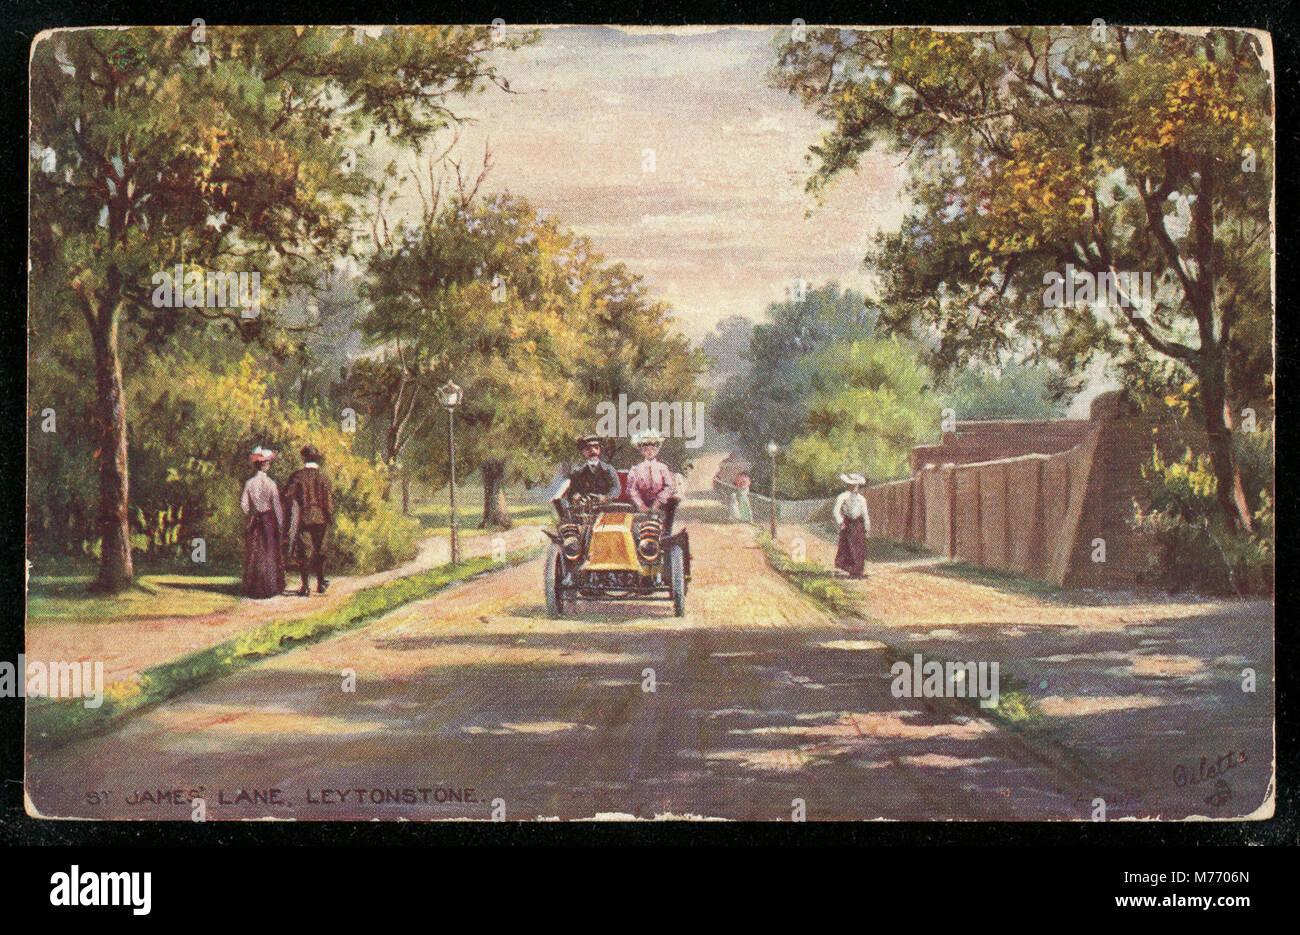 St. James' Lane. Leytonstone (NBY 440703) - Stock Image